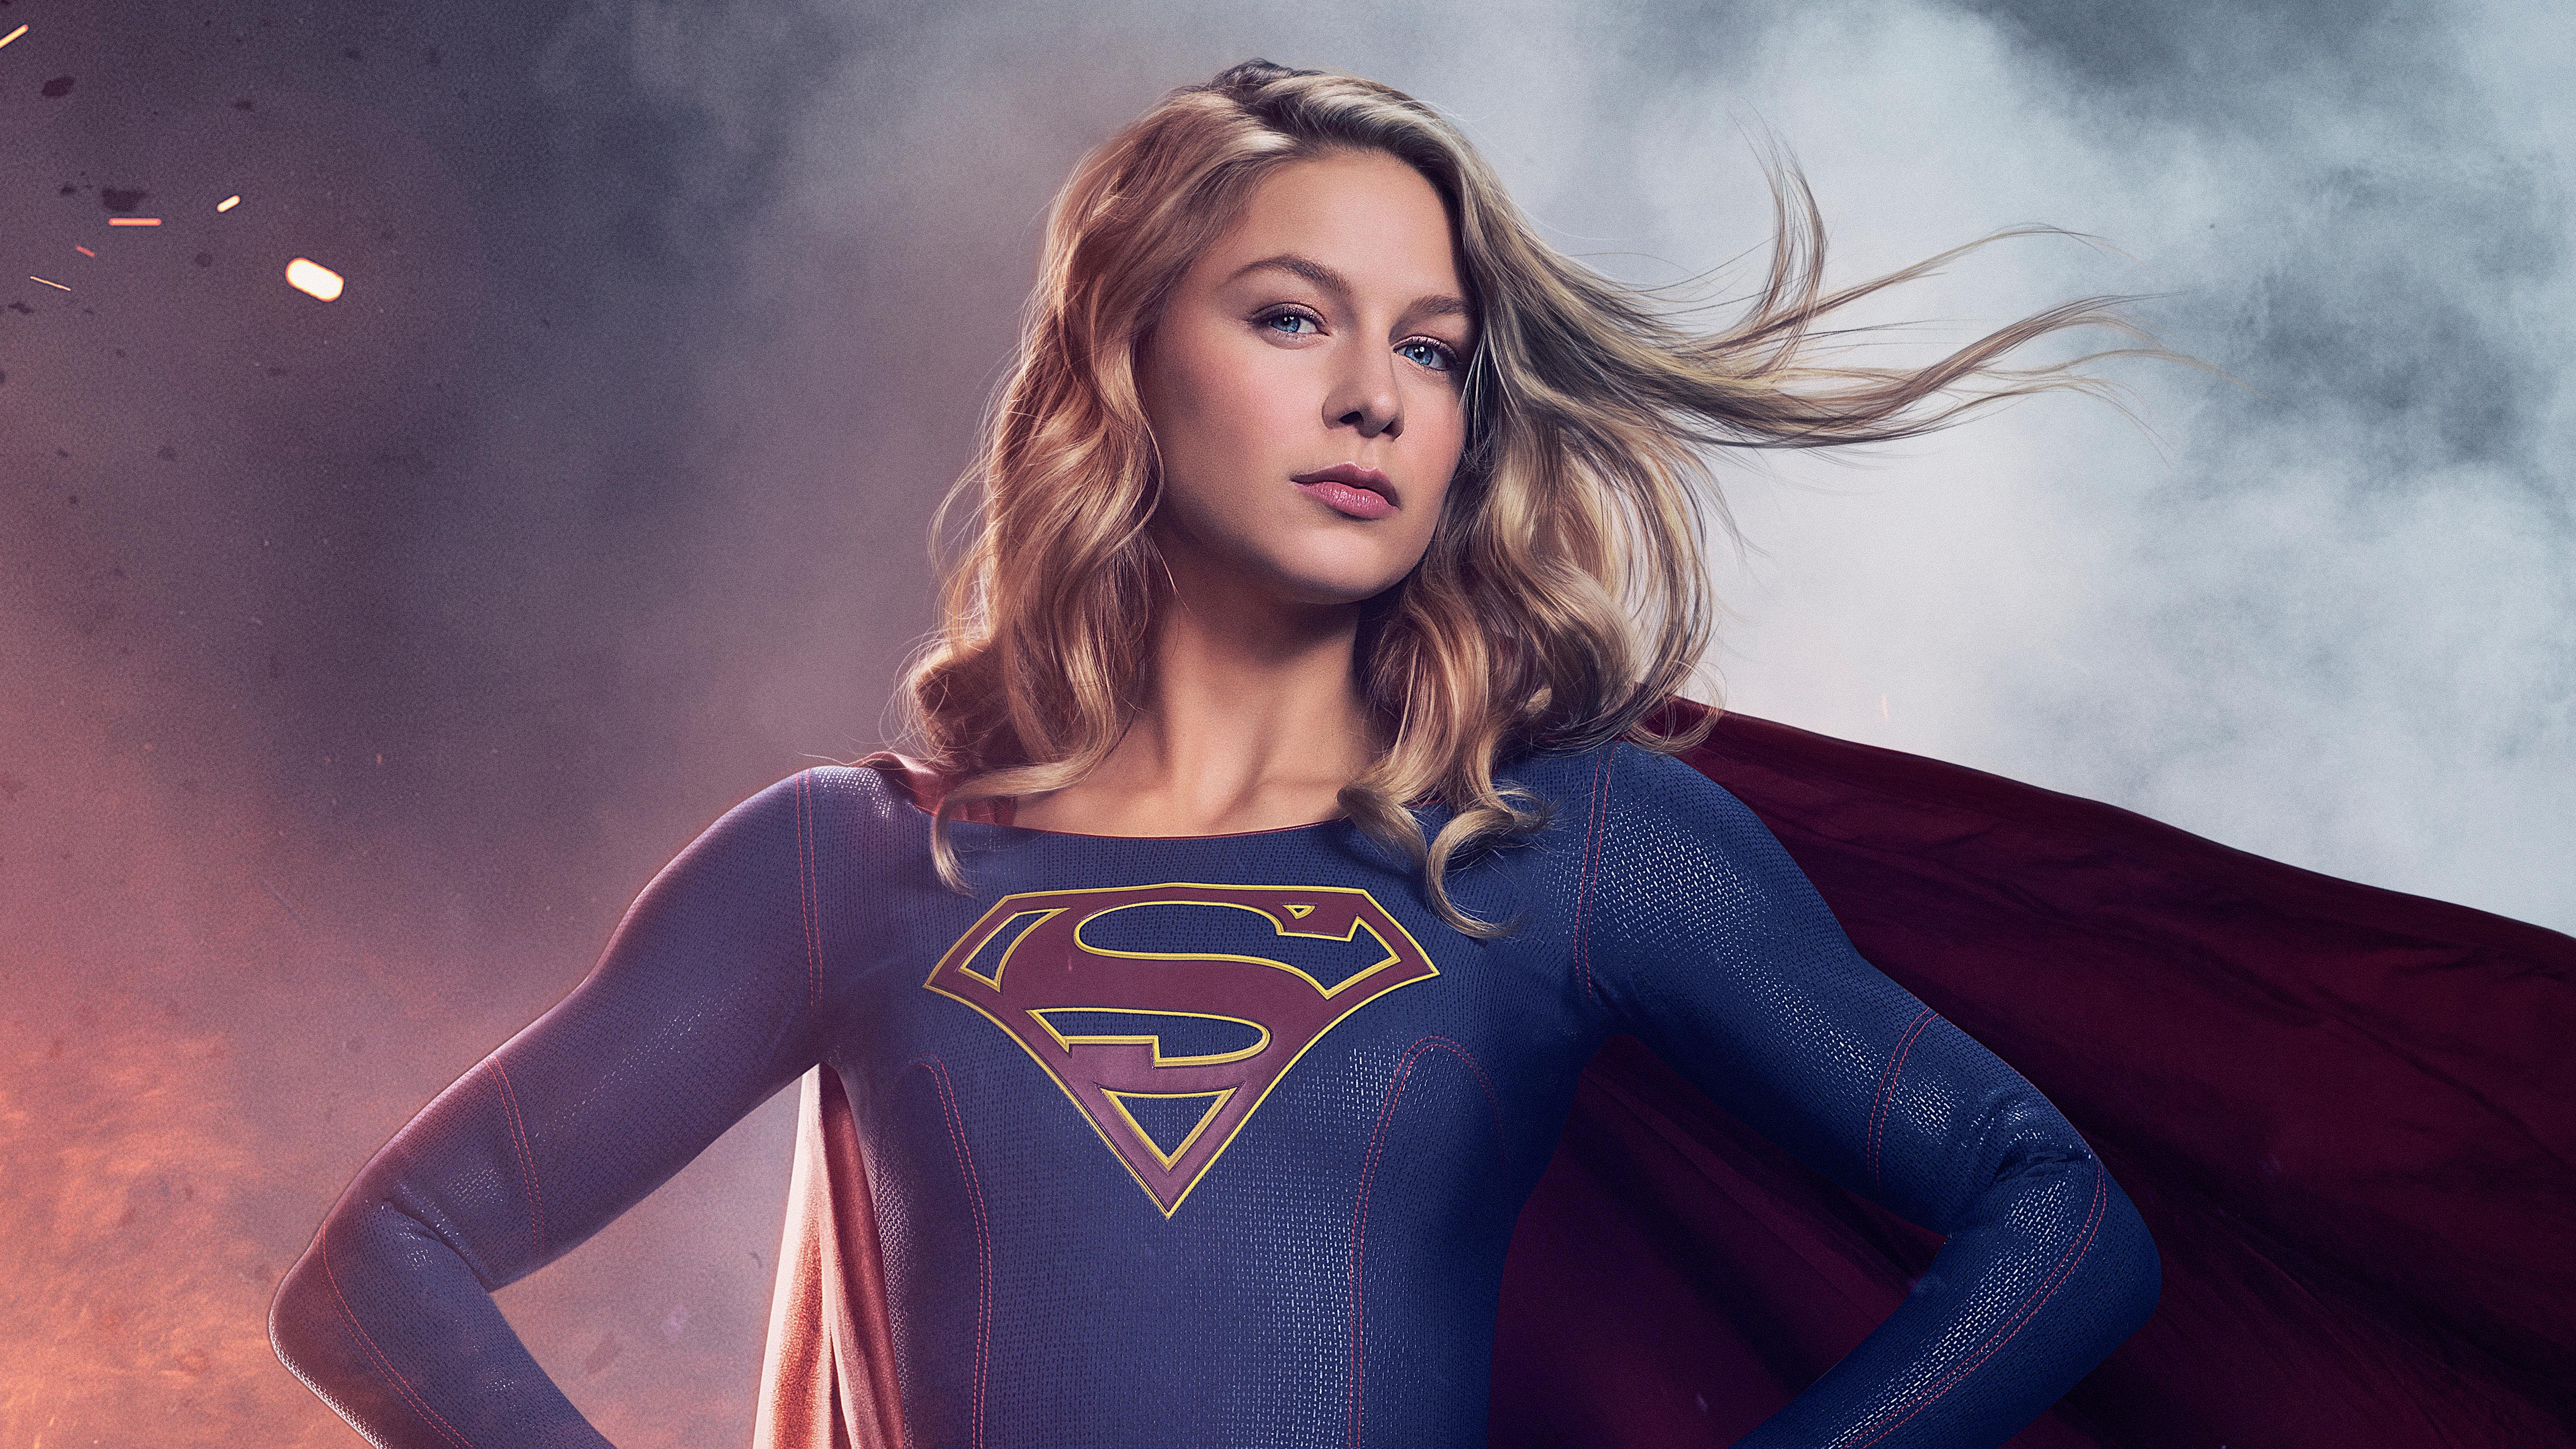 supergirl-season-5-8k-za.jpg